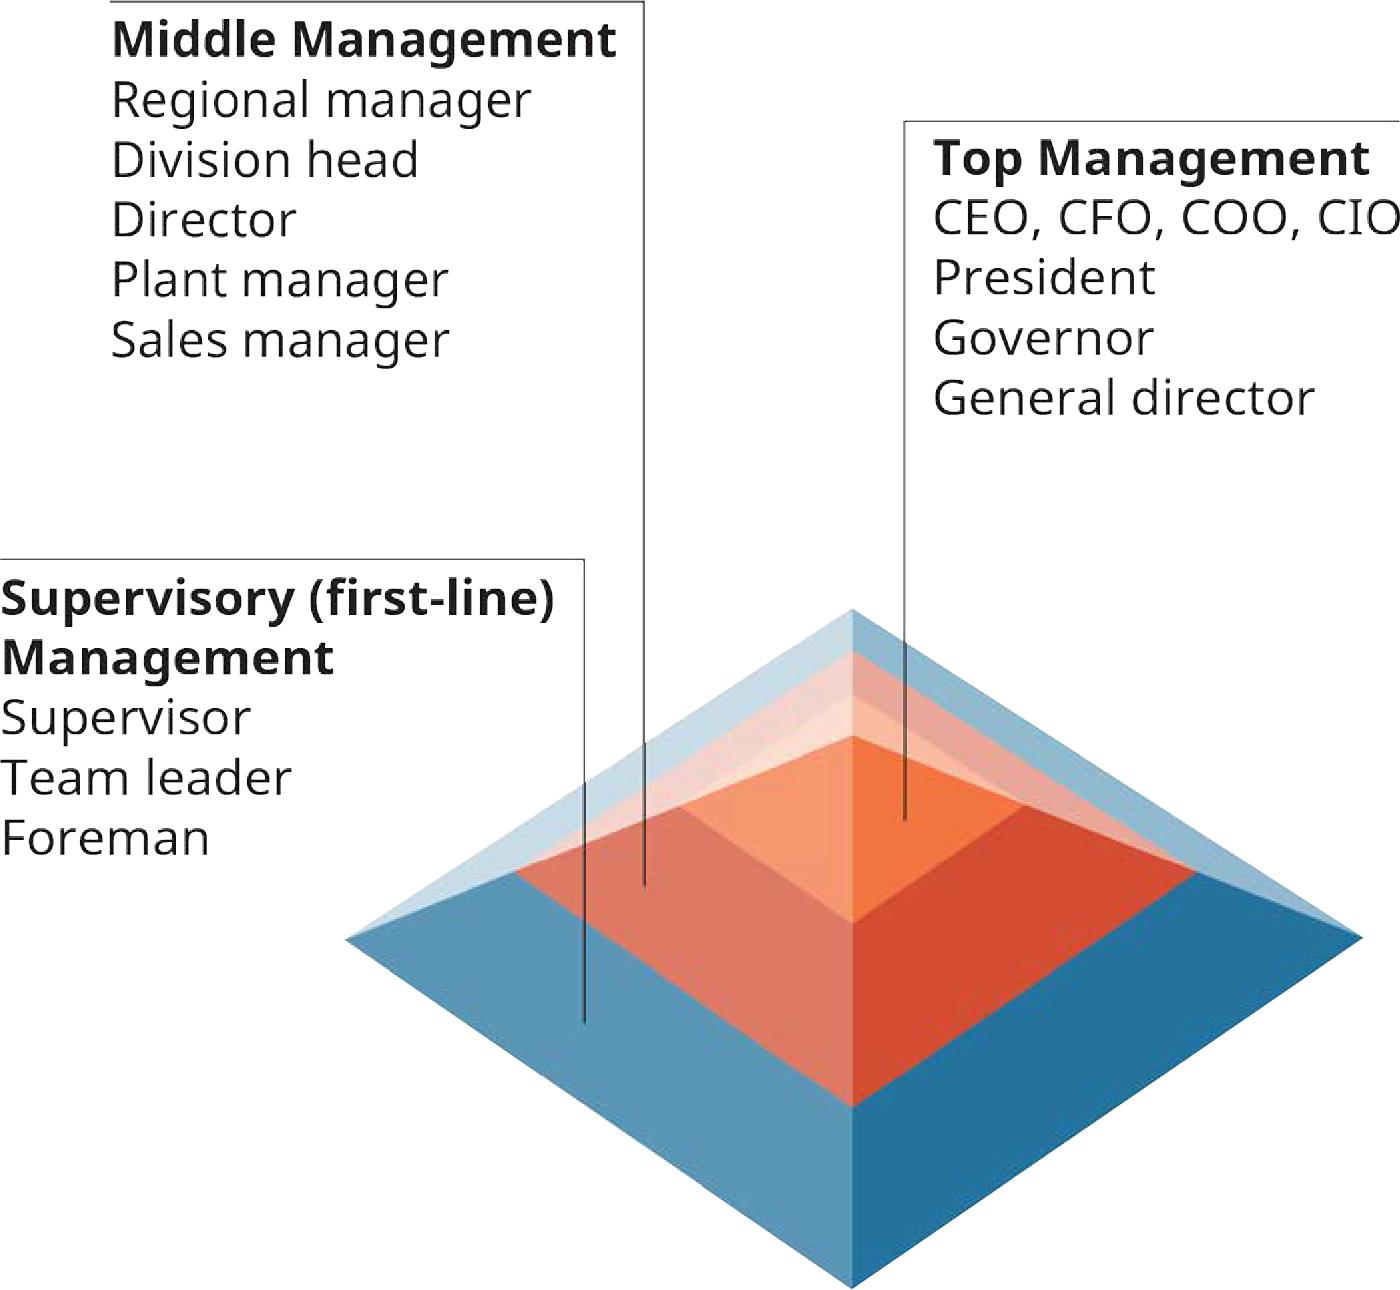 Exemplul 6.3 Piramida managerială (Atribuire: Copyright Rice University, OpenStax, sub licența CC BY 4.0.)